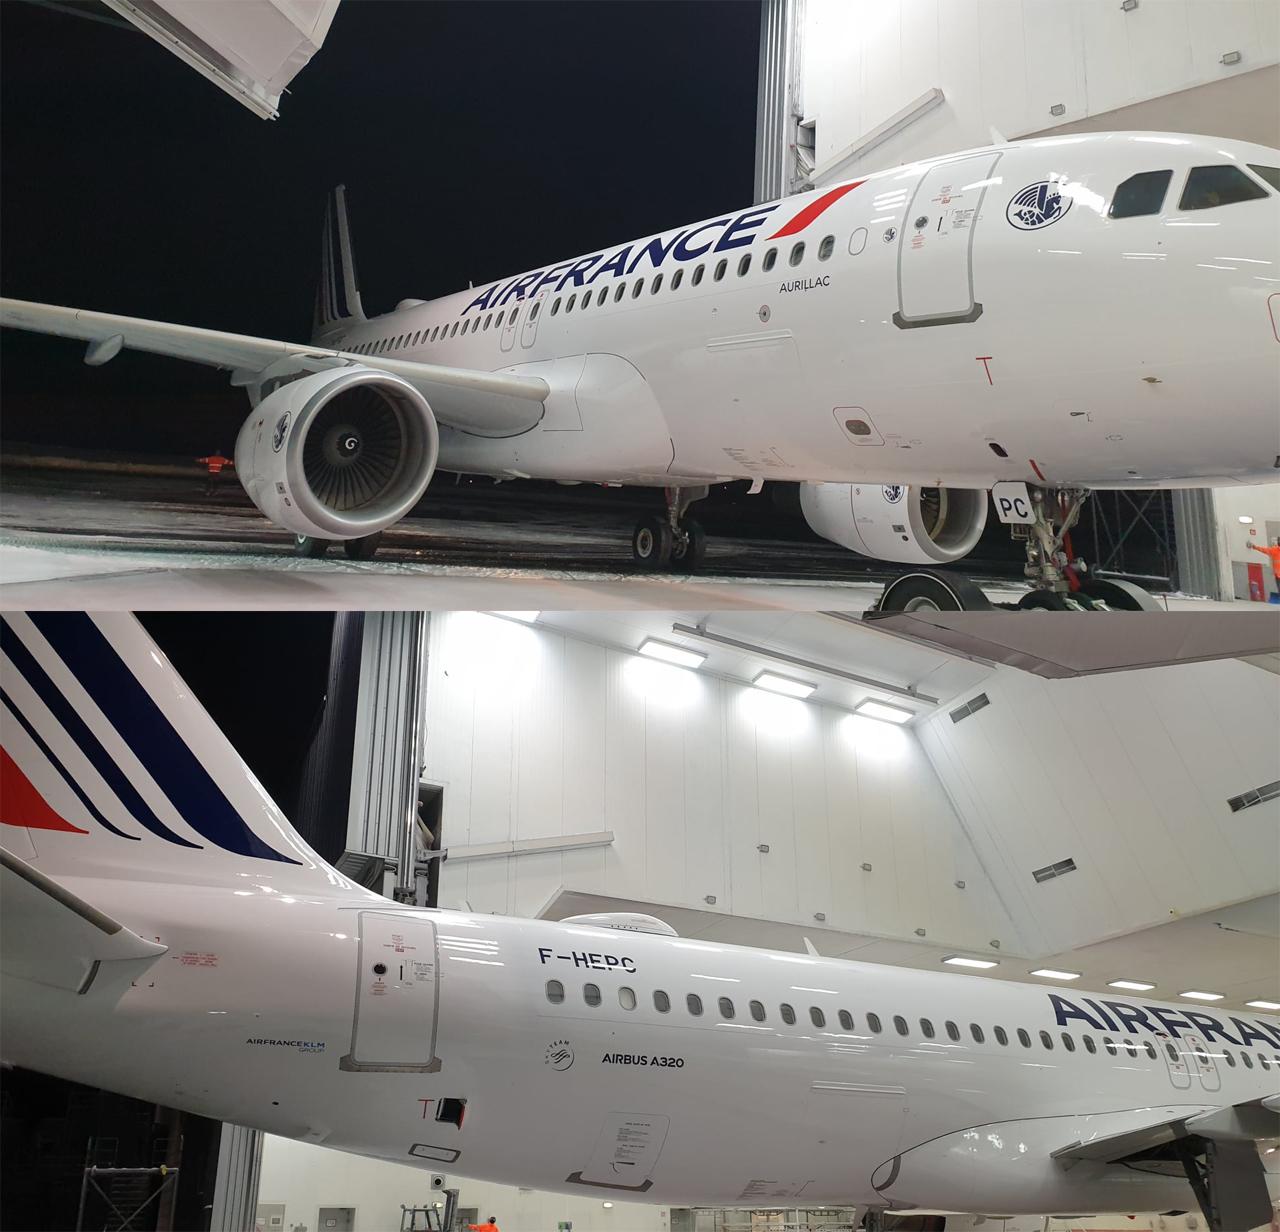 Air France A320new